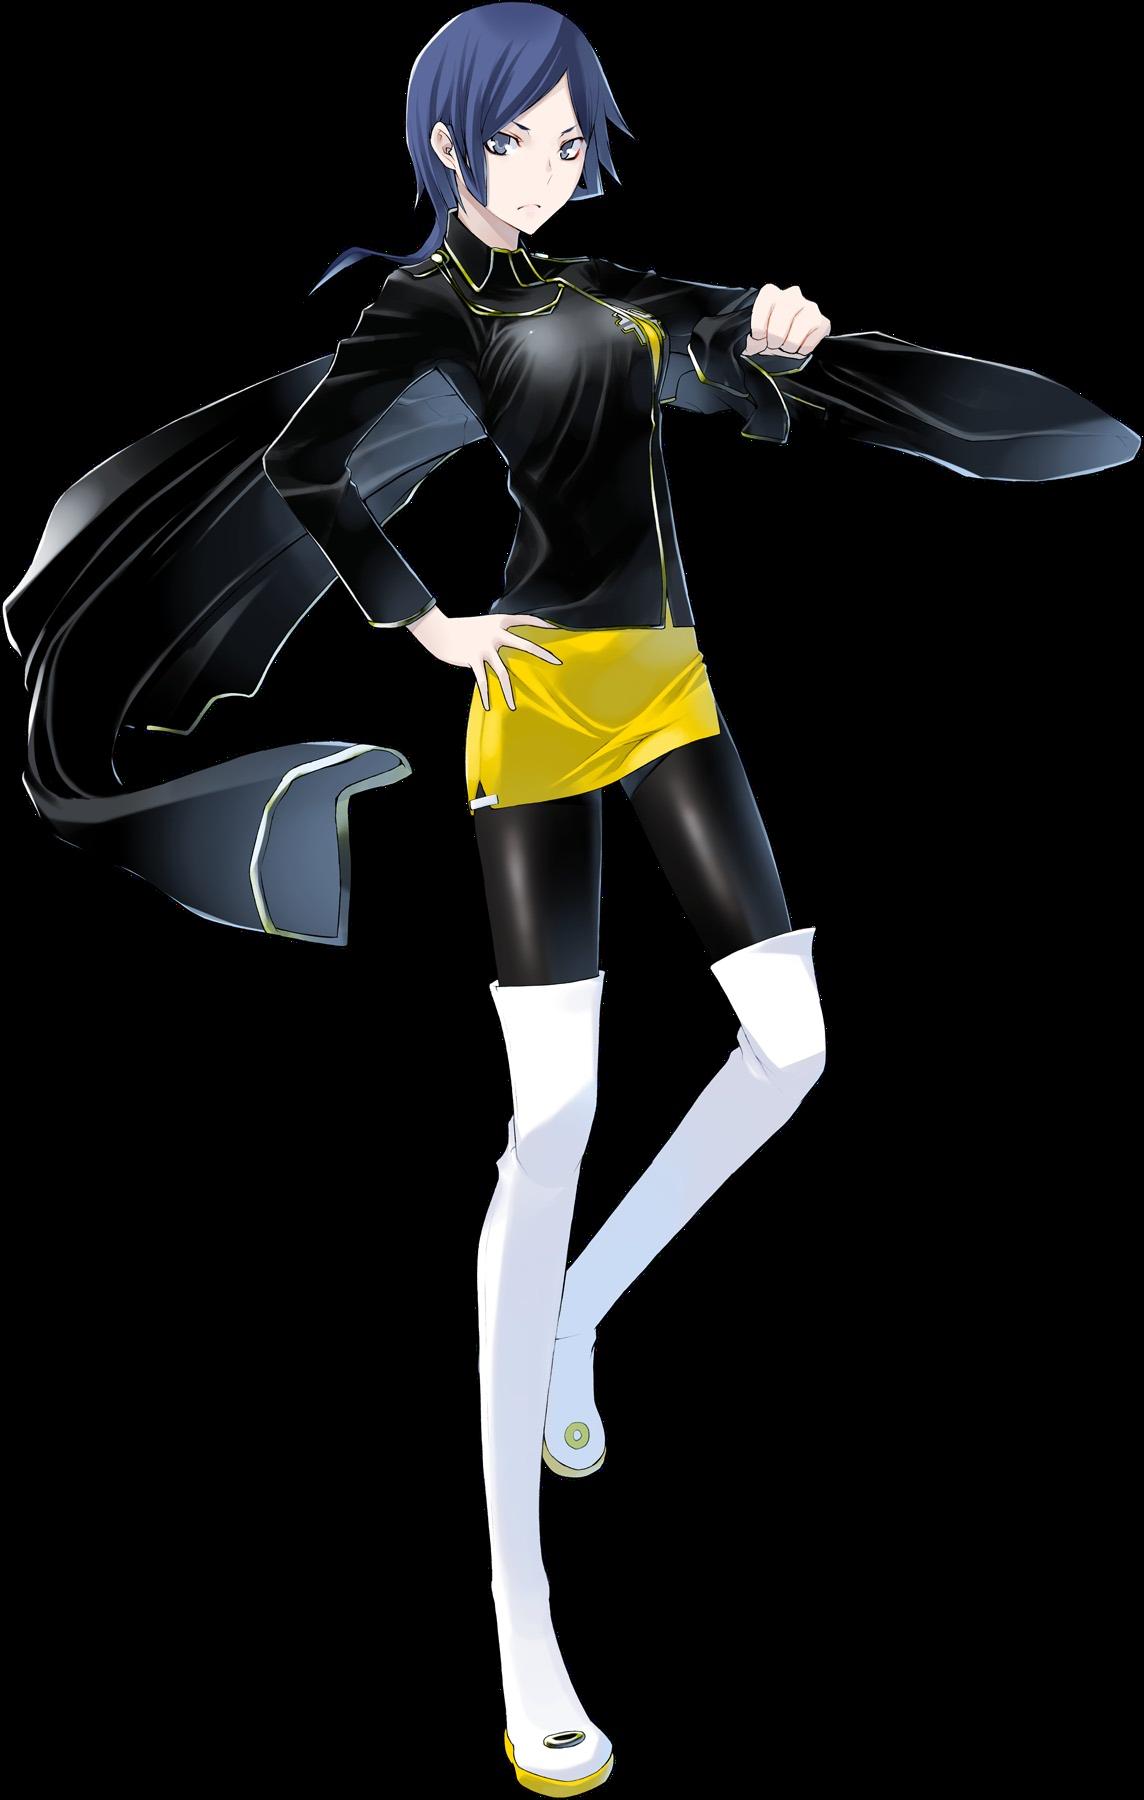 Makoto Sako Megami Tensei Wiki Fandom Powered By Wikia